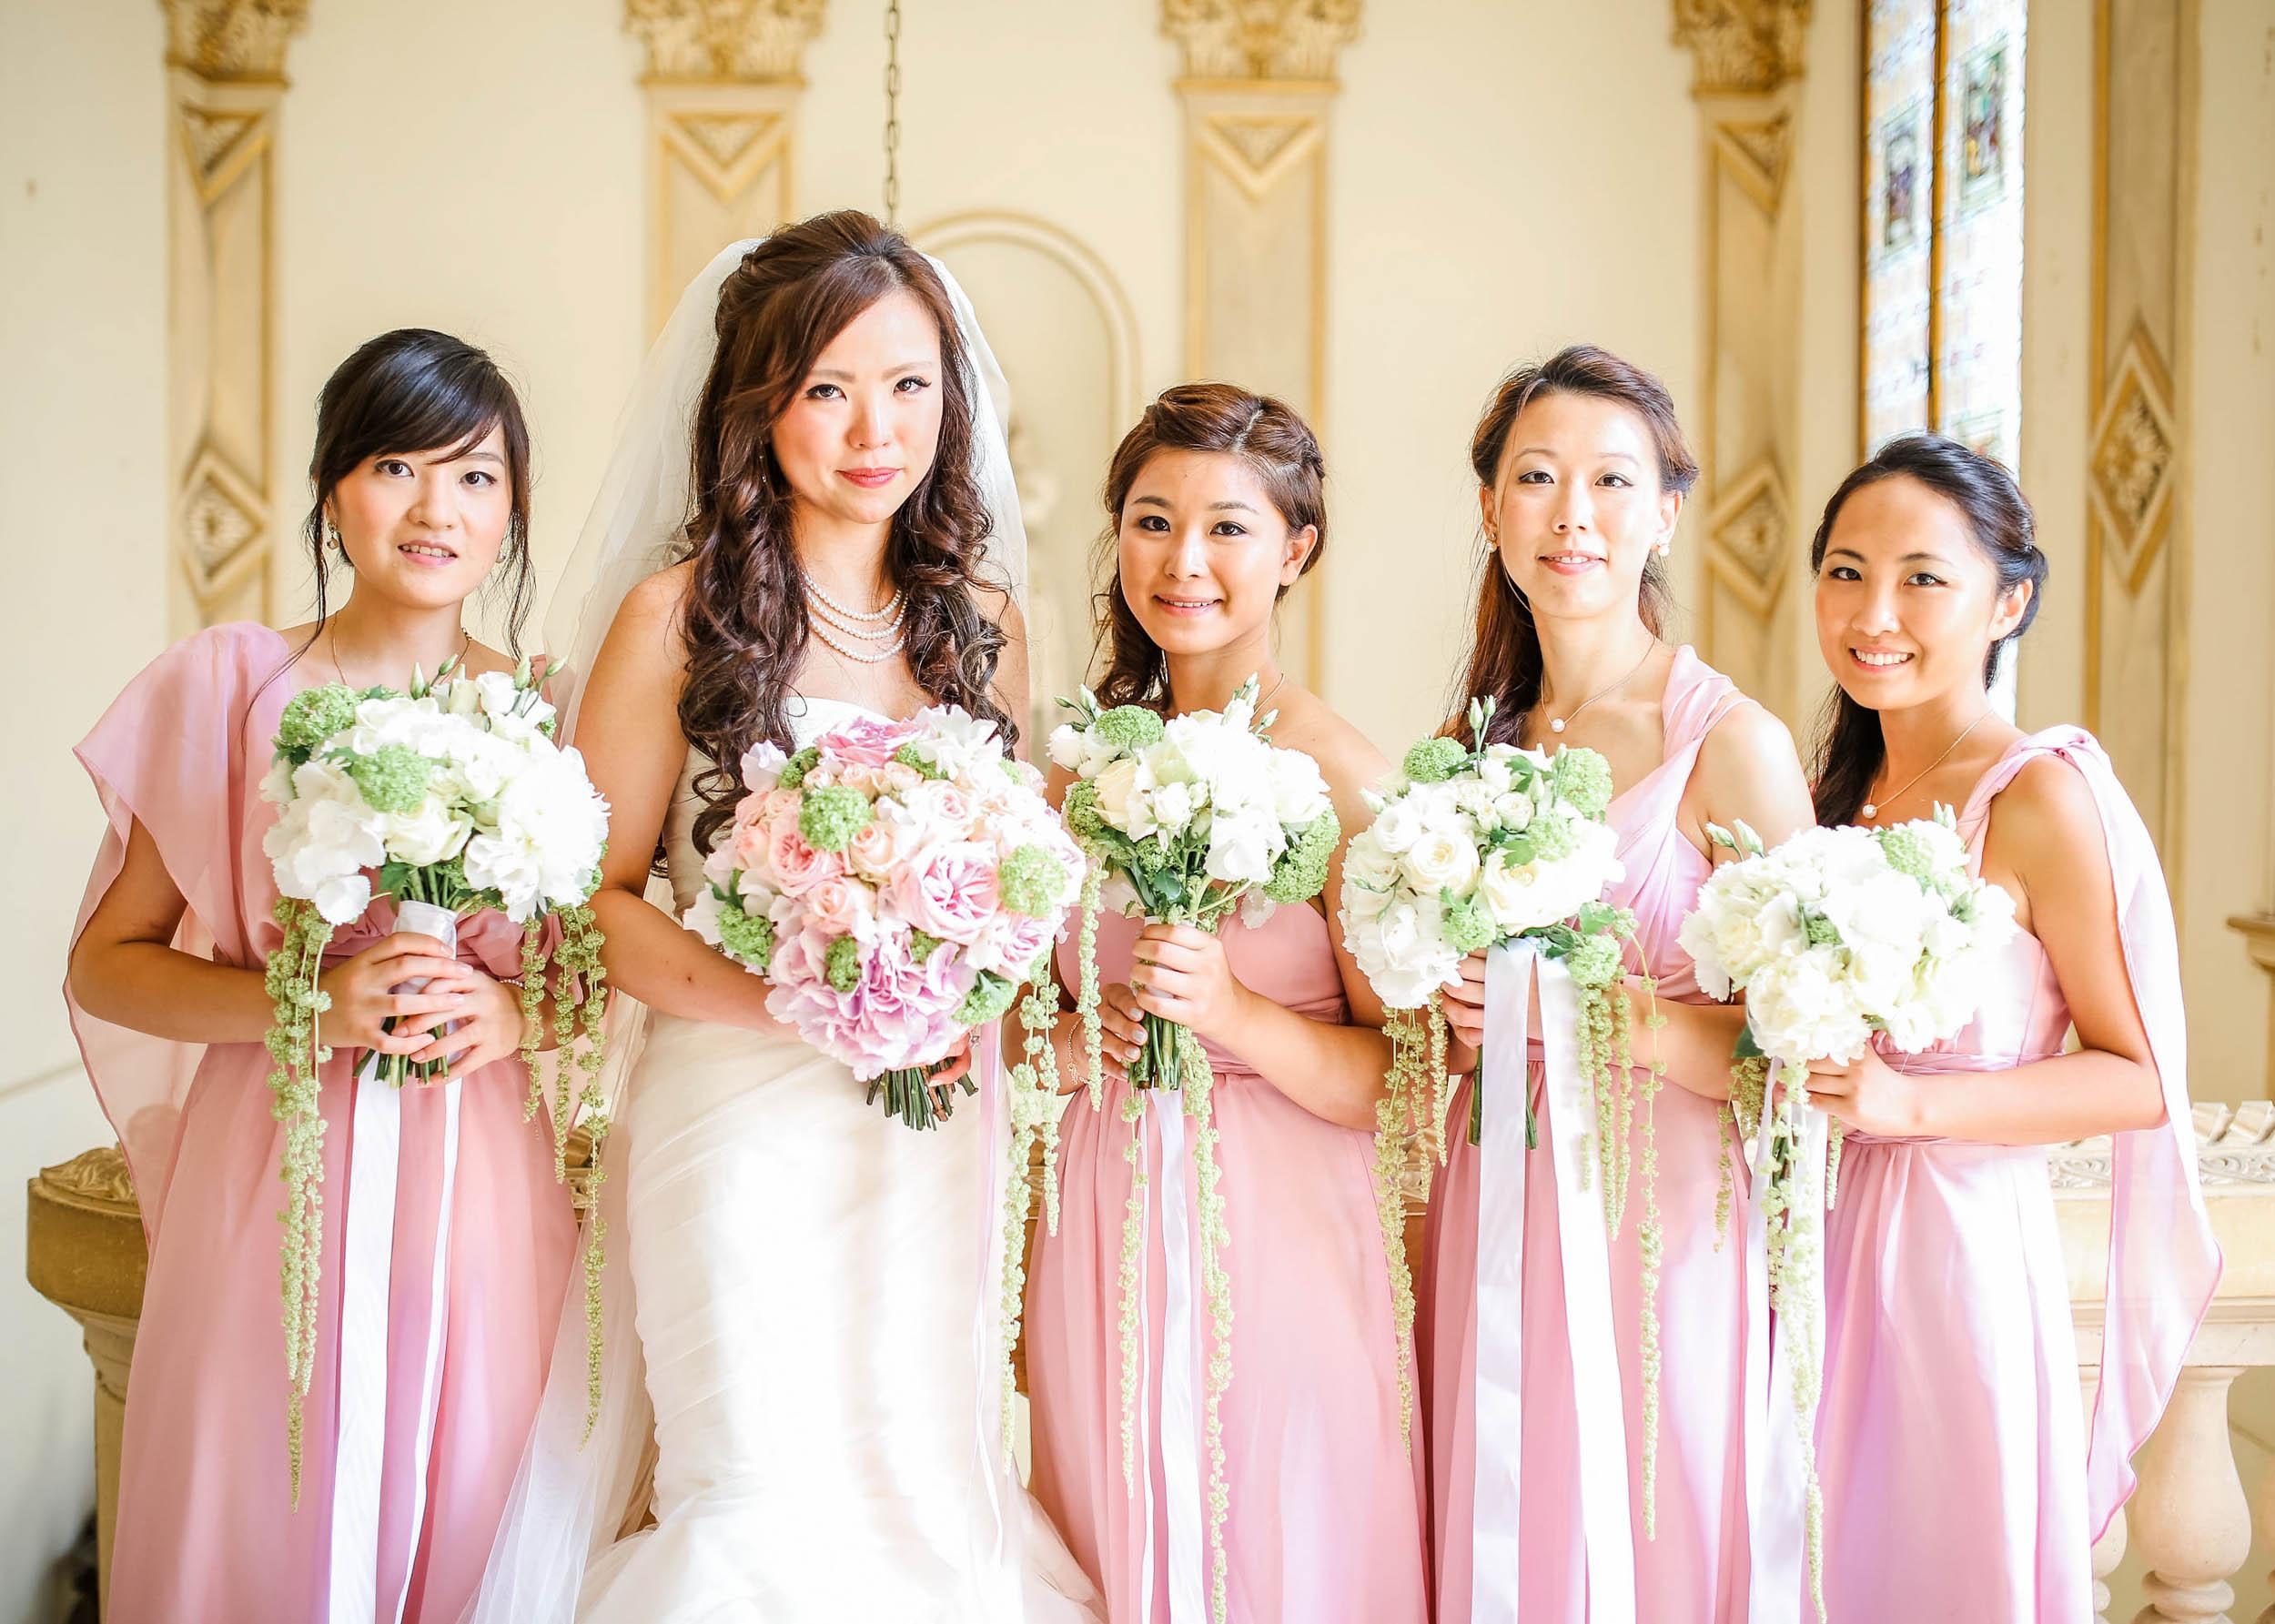 Amy O'Boyle Photography- Destination & UK Fine Art Film Wedding Photographer- Chateau La Durantie Wedding-6.jpg